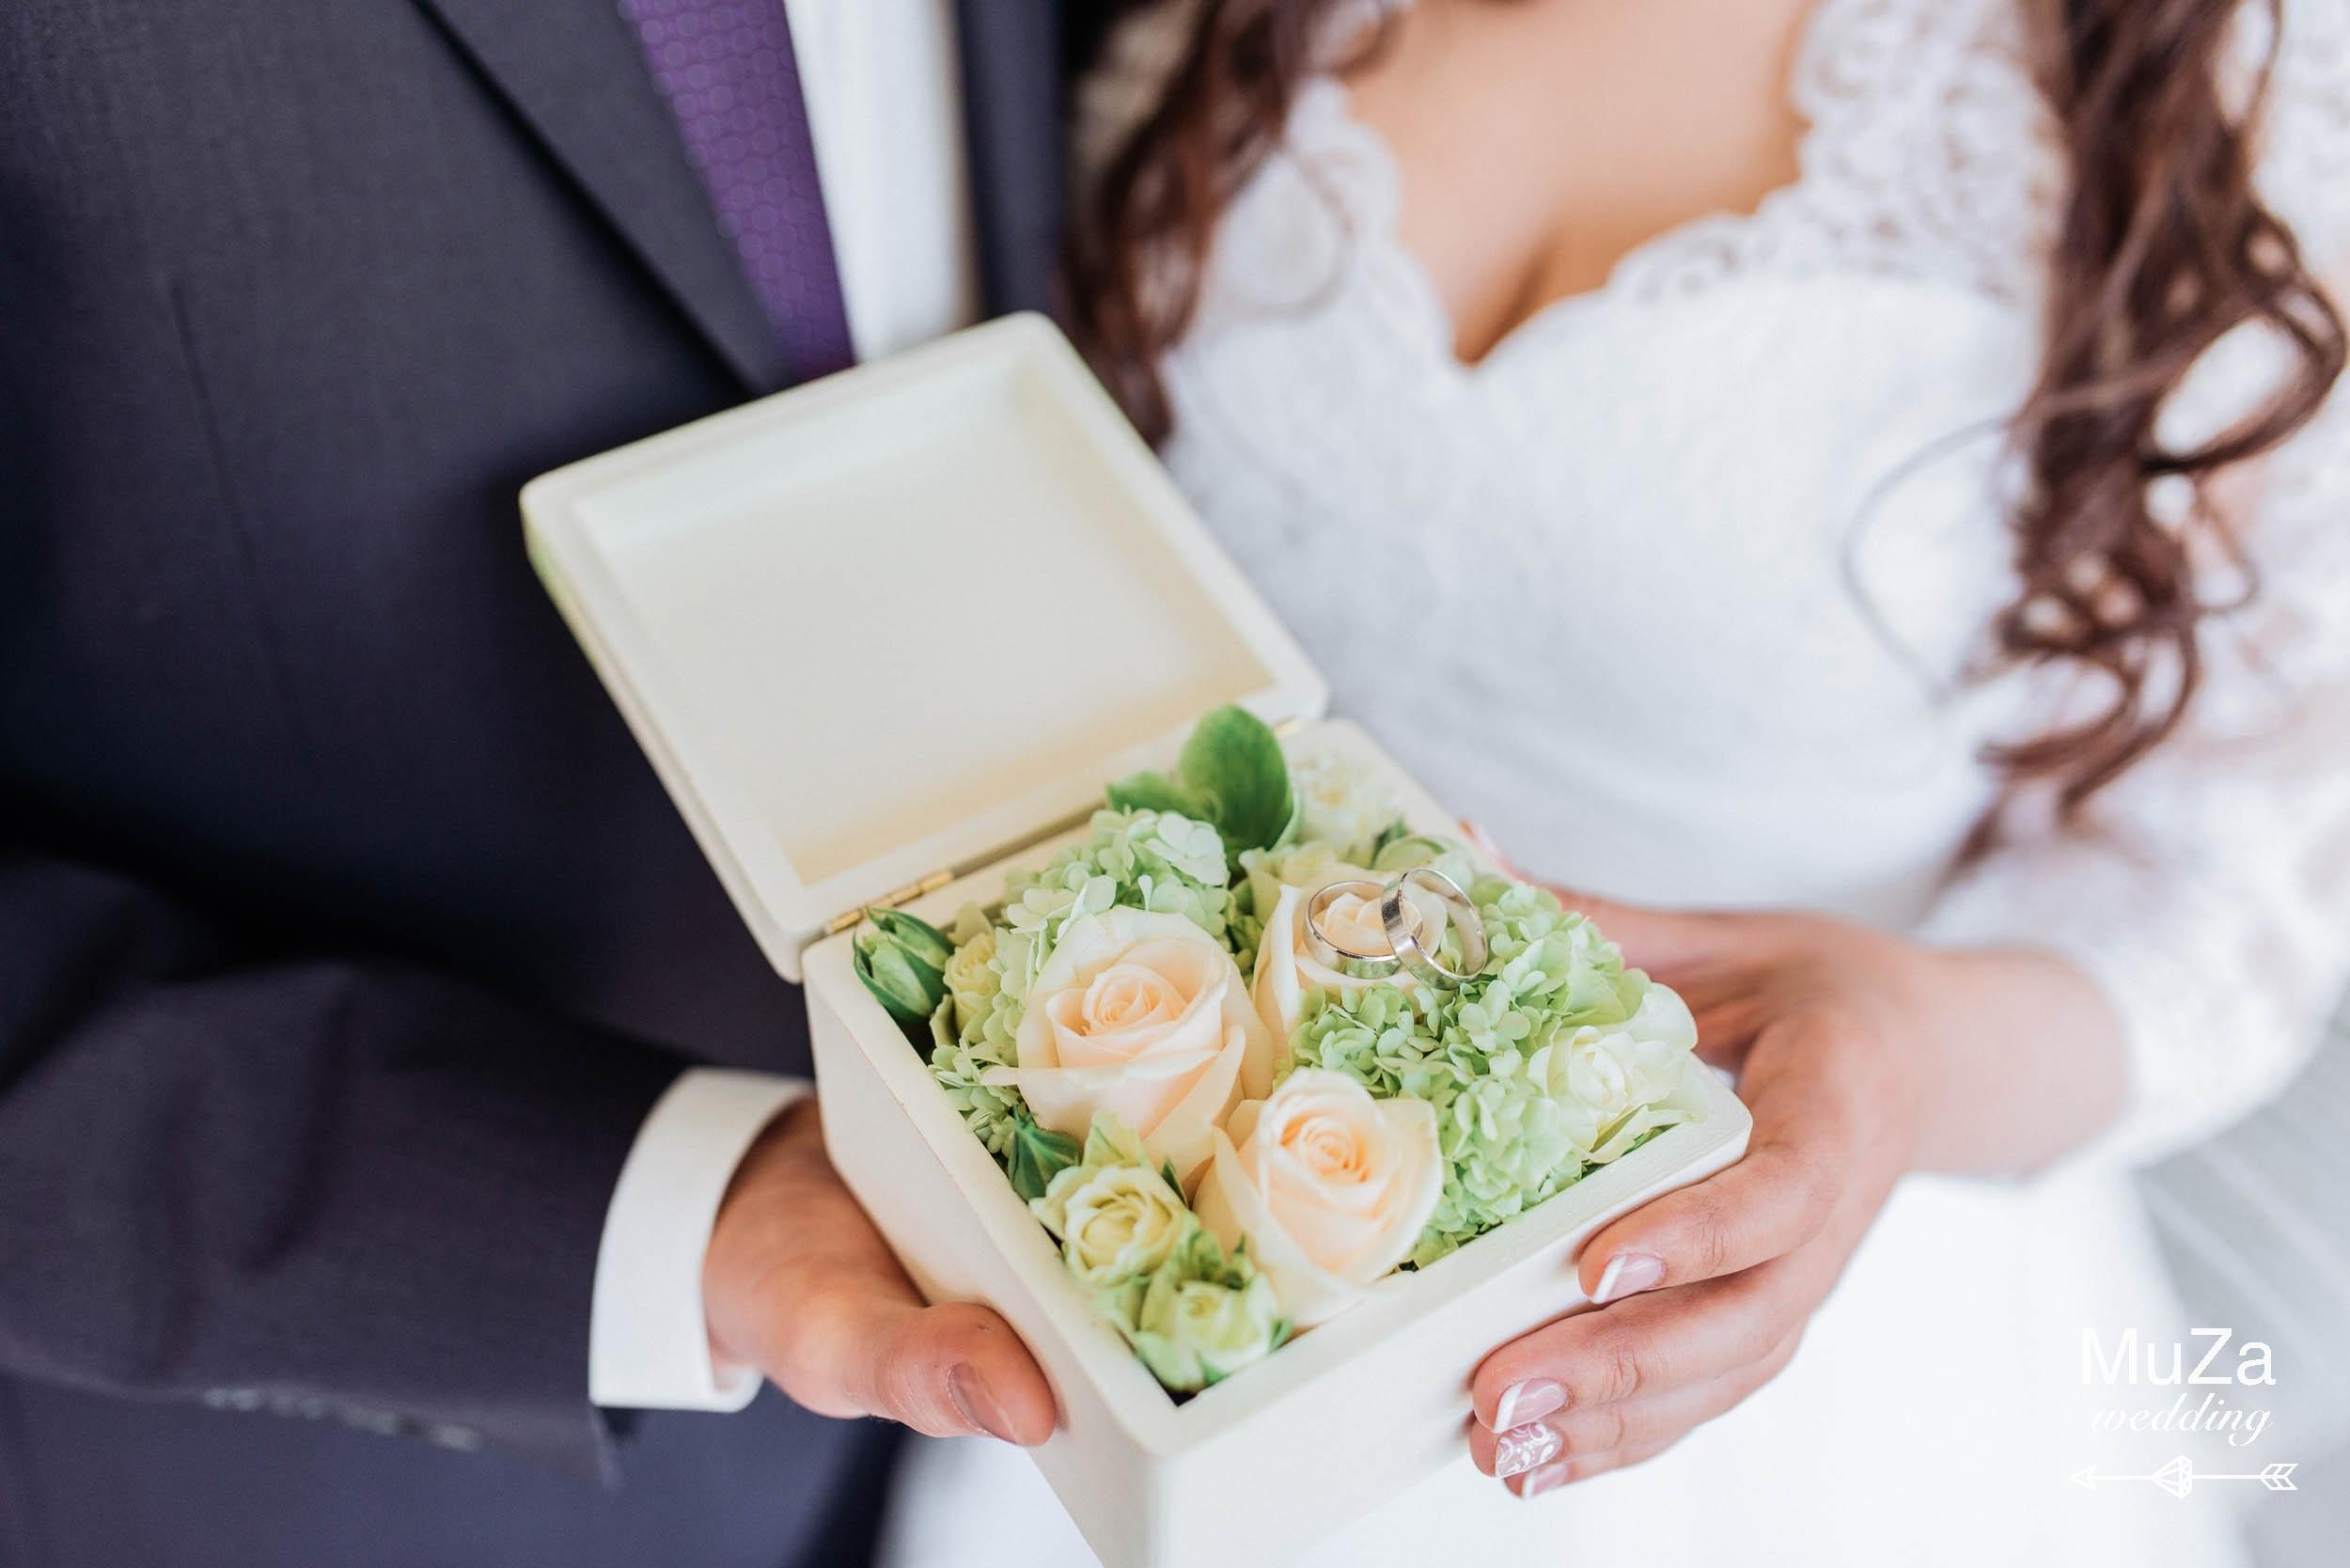 коробочка для колец на свадьбе